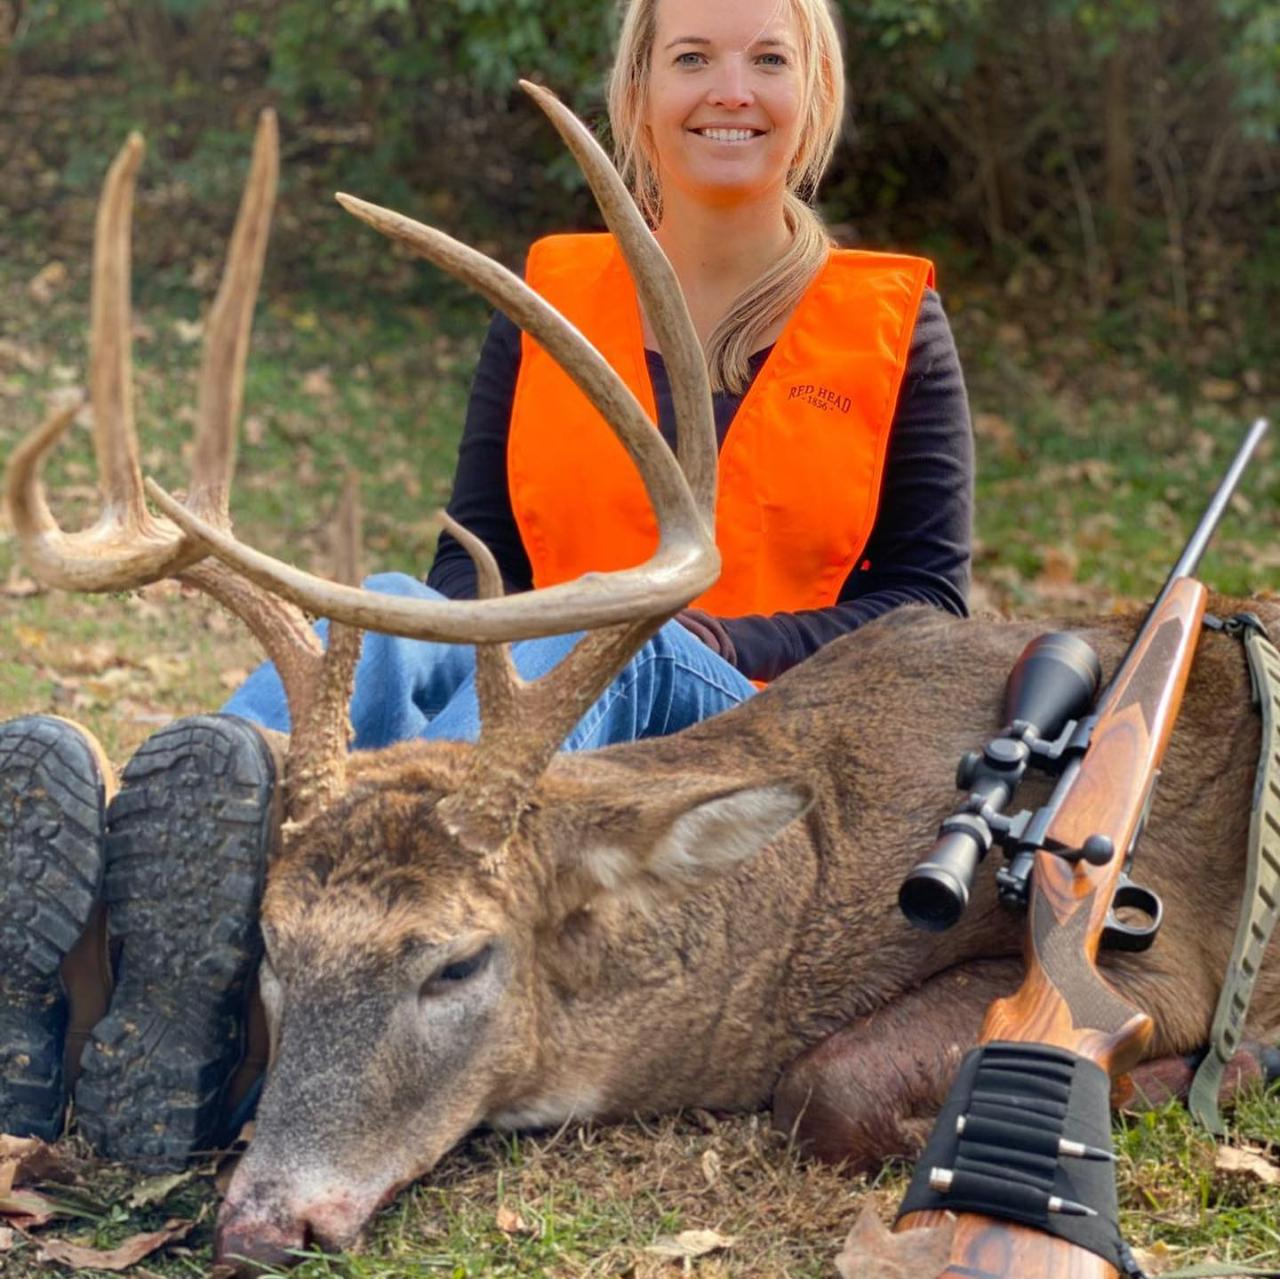 North Camp Kentucky 2 Day 3 Night Rifle Hunt - Opening Week within Ky Deer Season 2021